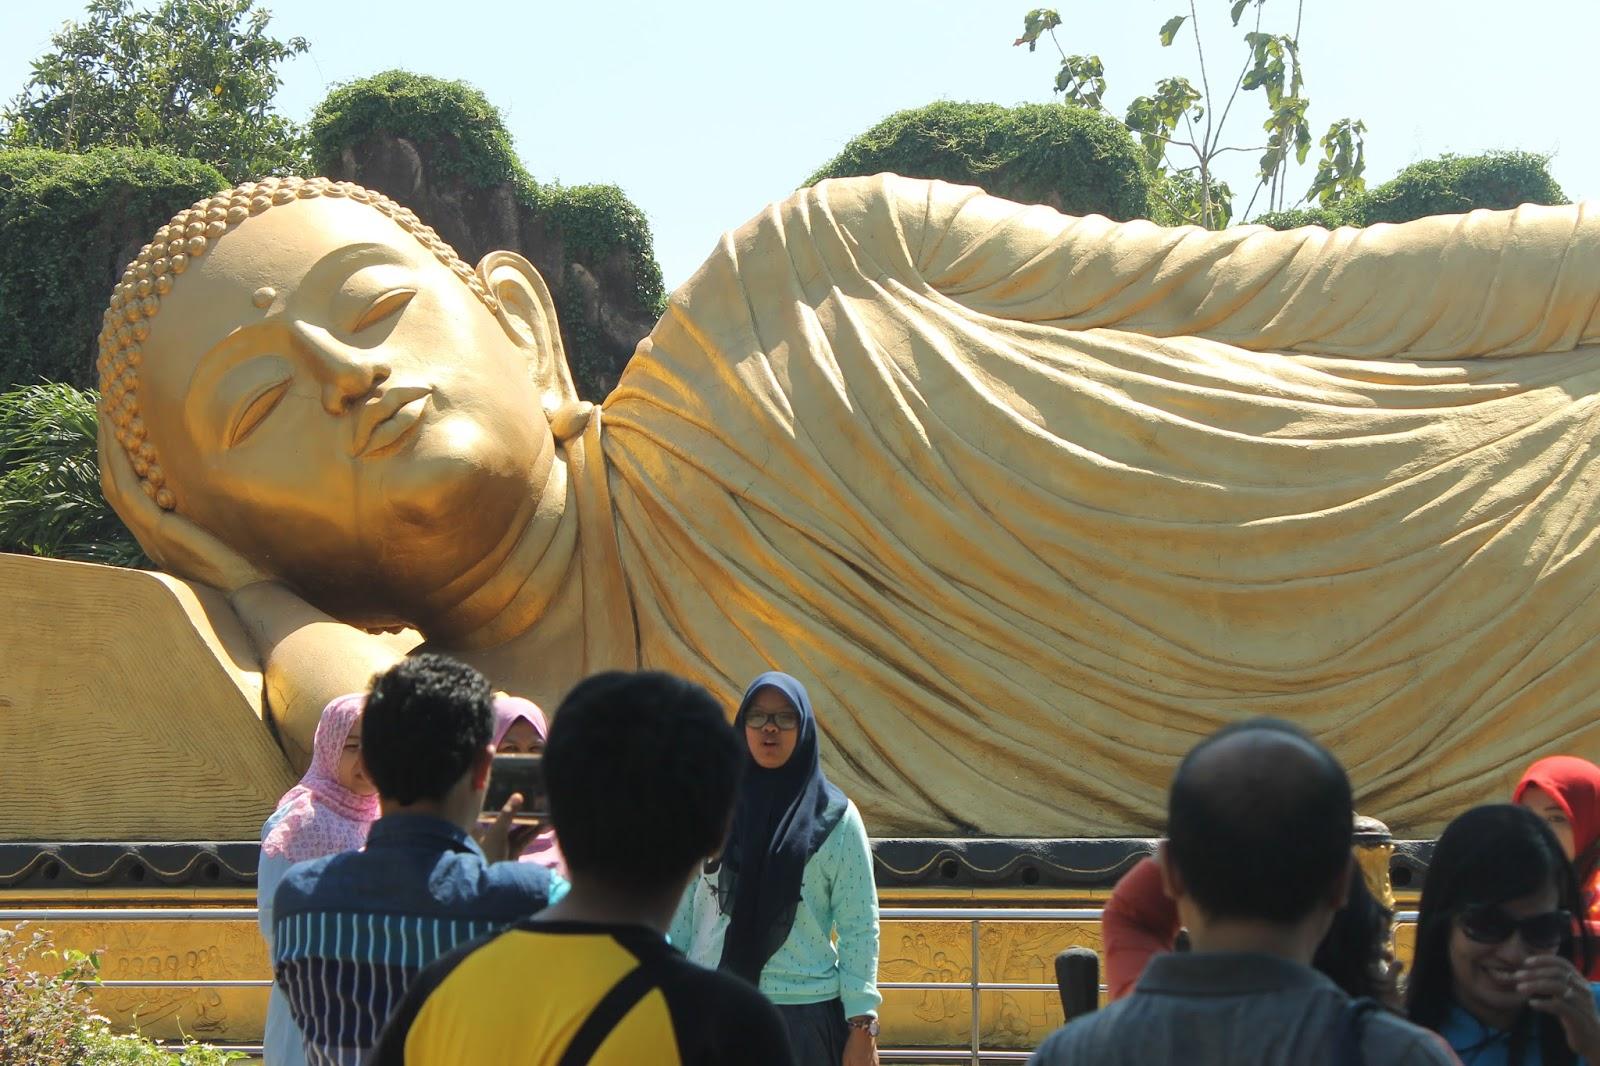 Memoar Patung Budha Tidur Mojokerto Obyek Wisata Hemat Biaya Sekitar